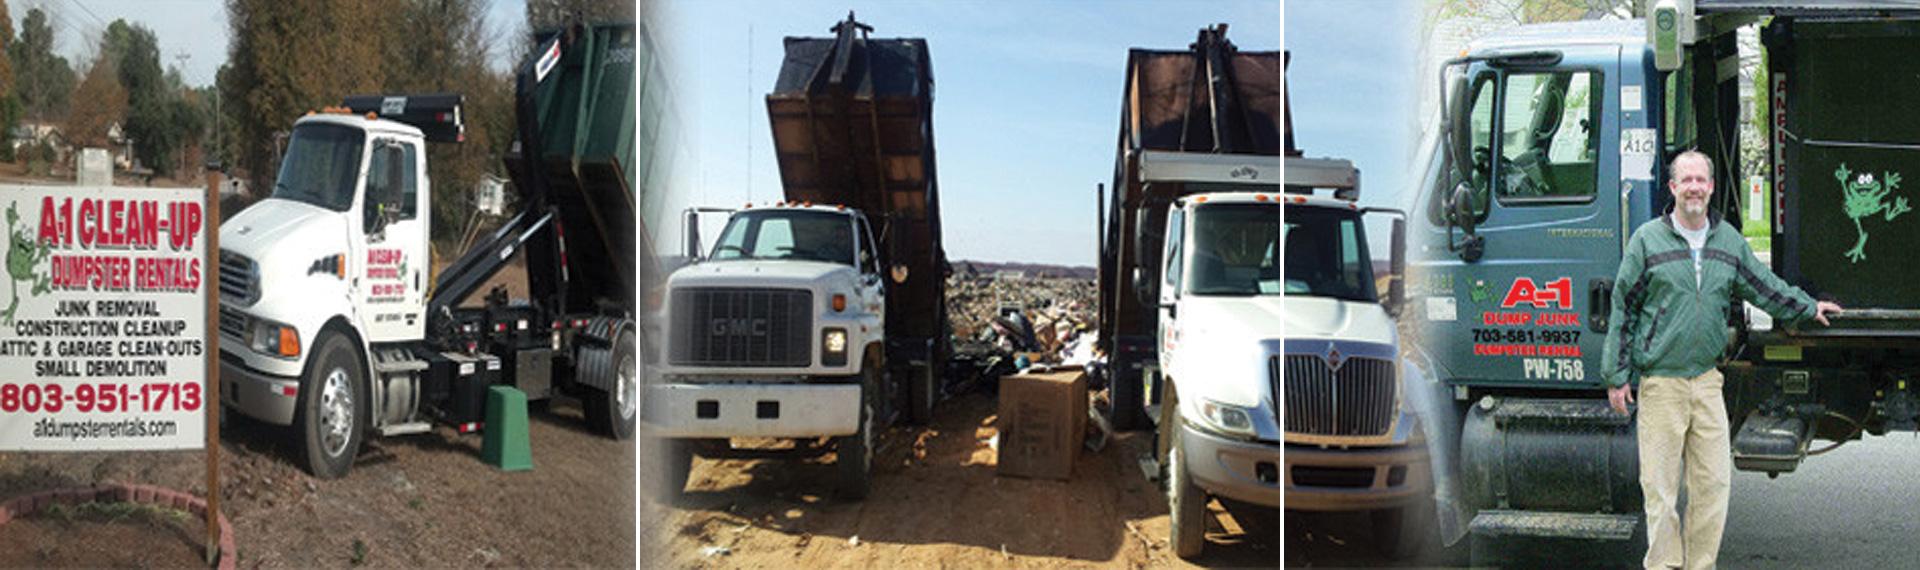 A1 Dumpster Rentals Kannapolis NC